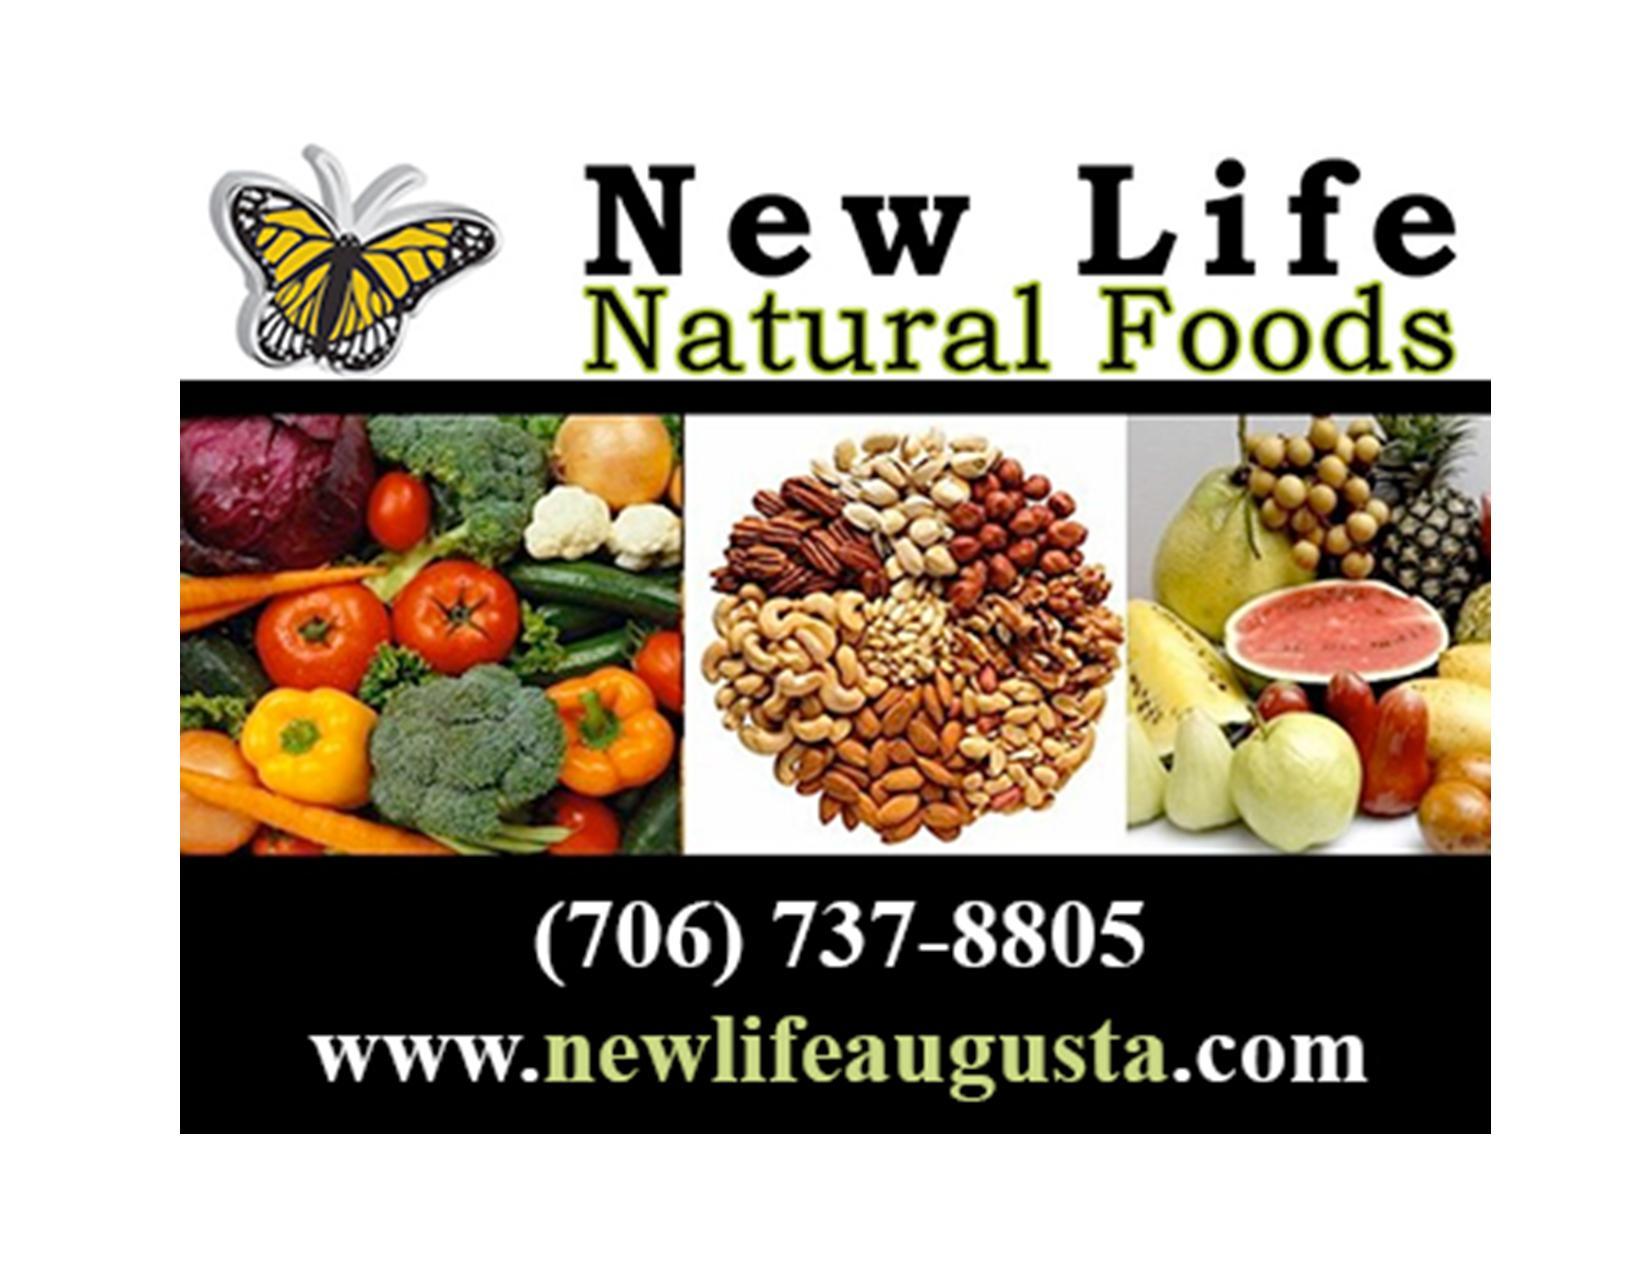 New Life Natural Foods Augusta Ga